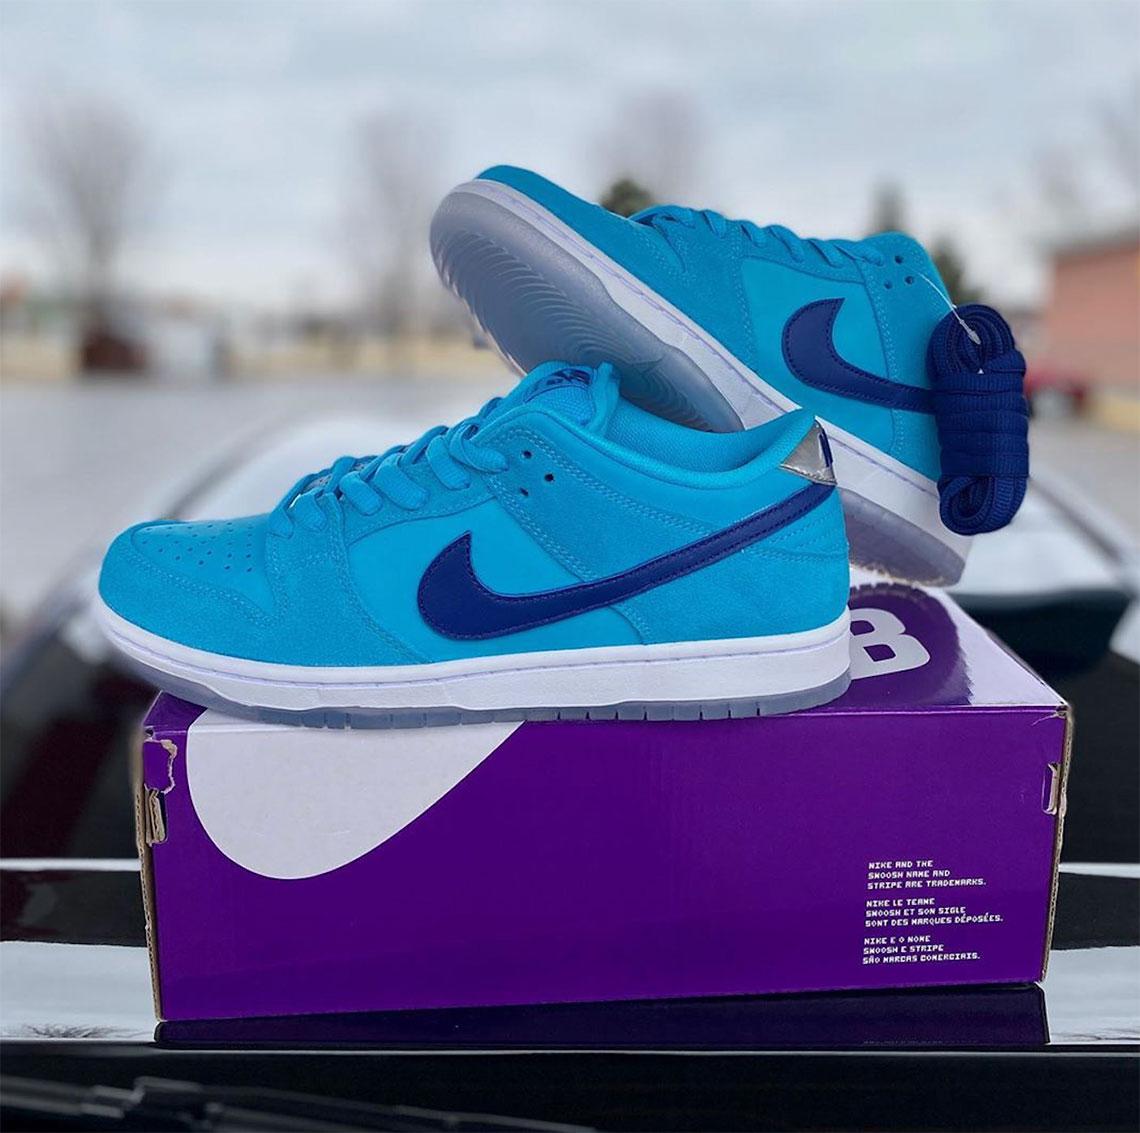 Rana Polinizador fe  Nike SB Dunk Low Blue Fury BQ6817-400 Release Info - The Dope Timez